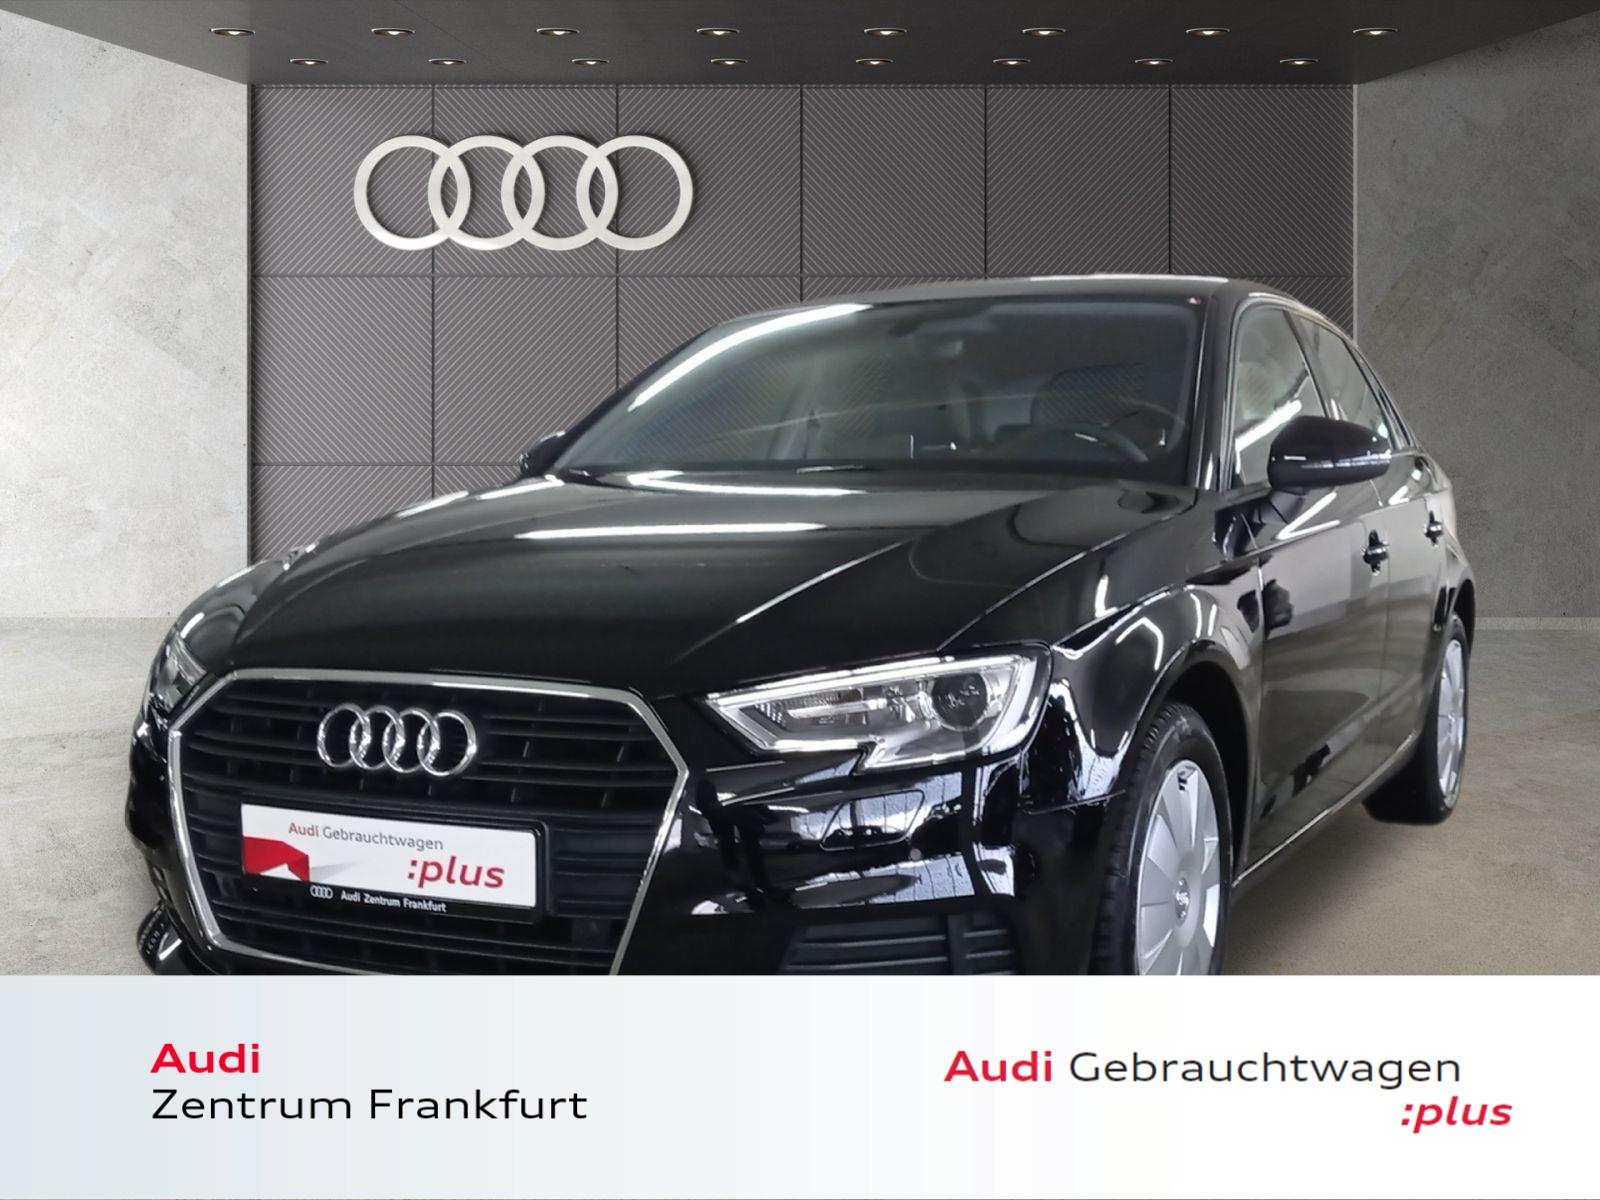 Audi A3 Sportback 30 TFSI Xenon Navi PDC Bluetooth Sitzheizung, Jahr 2019, Benzin